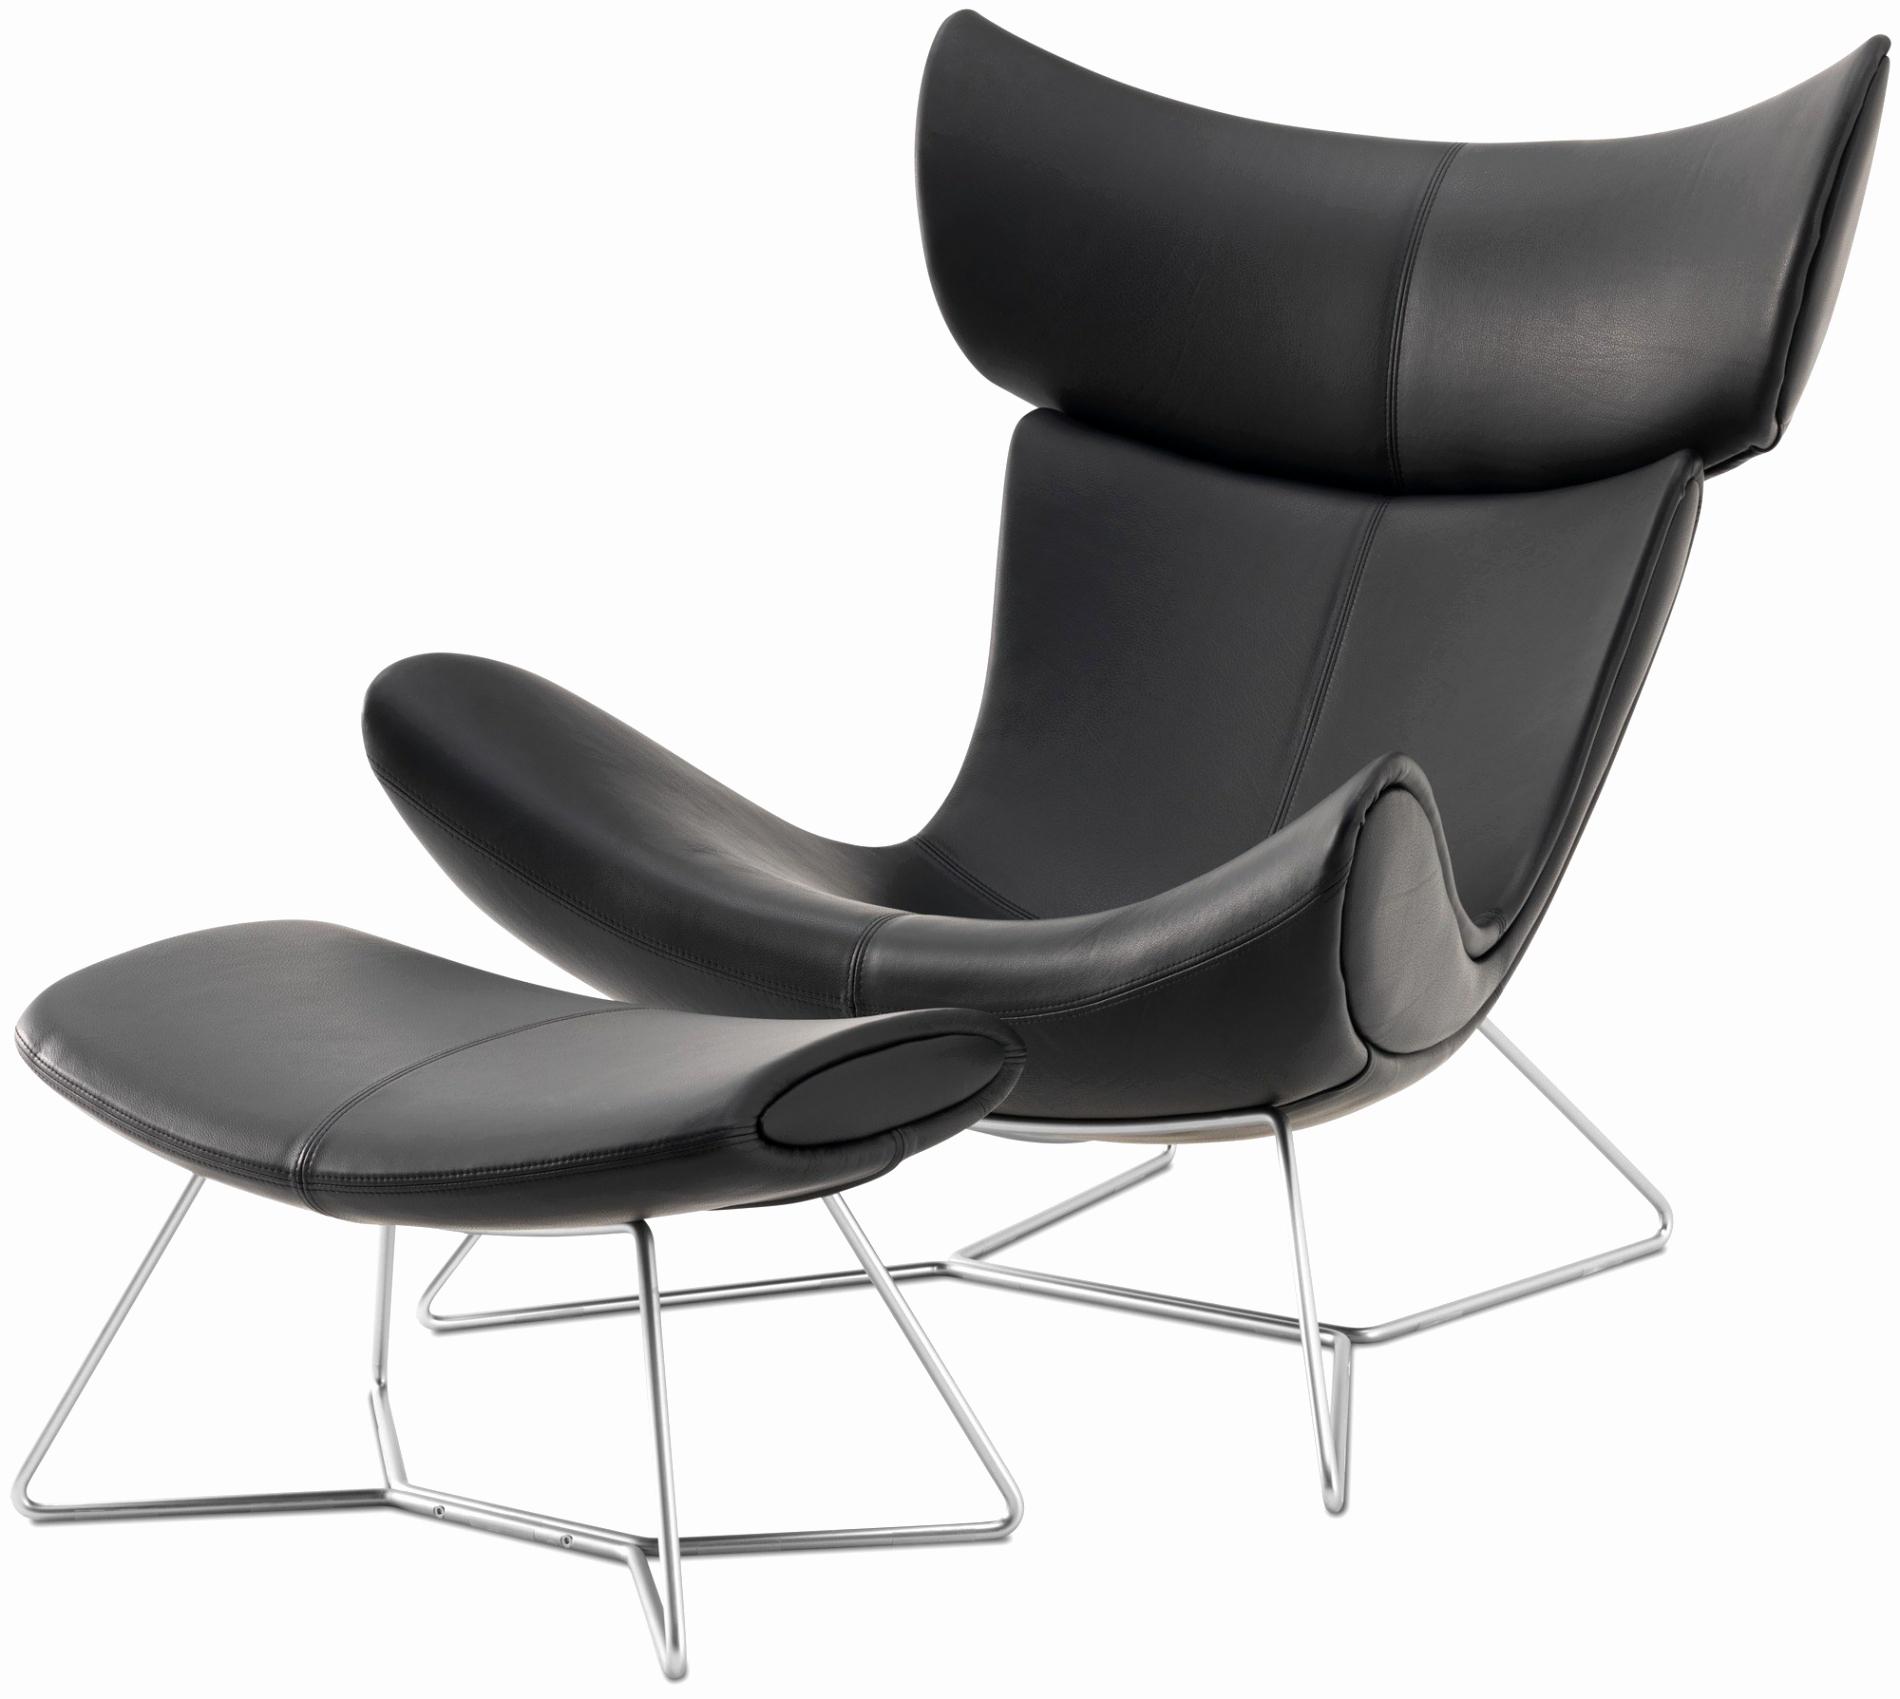 chaise bureau ikea inspirant chaise ikea bureau chaise ikea cuisine cuisine fauteuil salon 0d of chaise bureau ikea